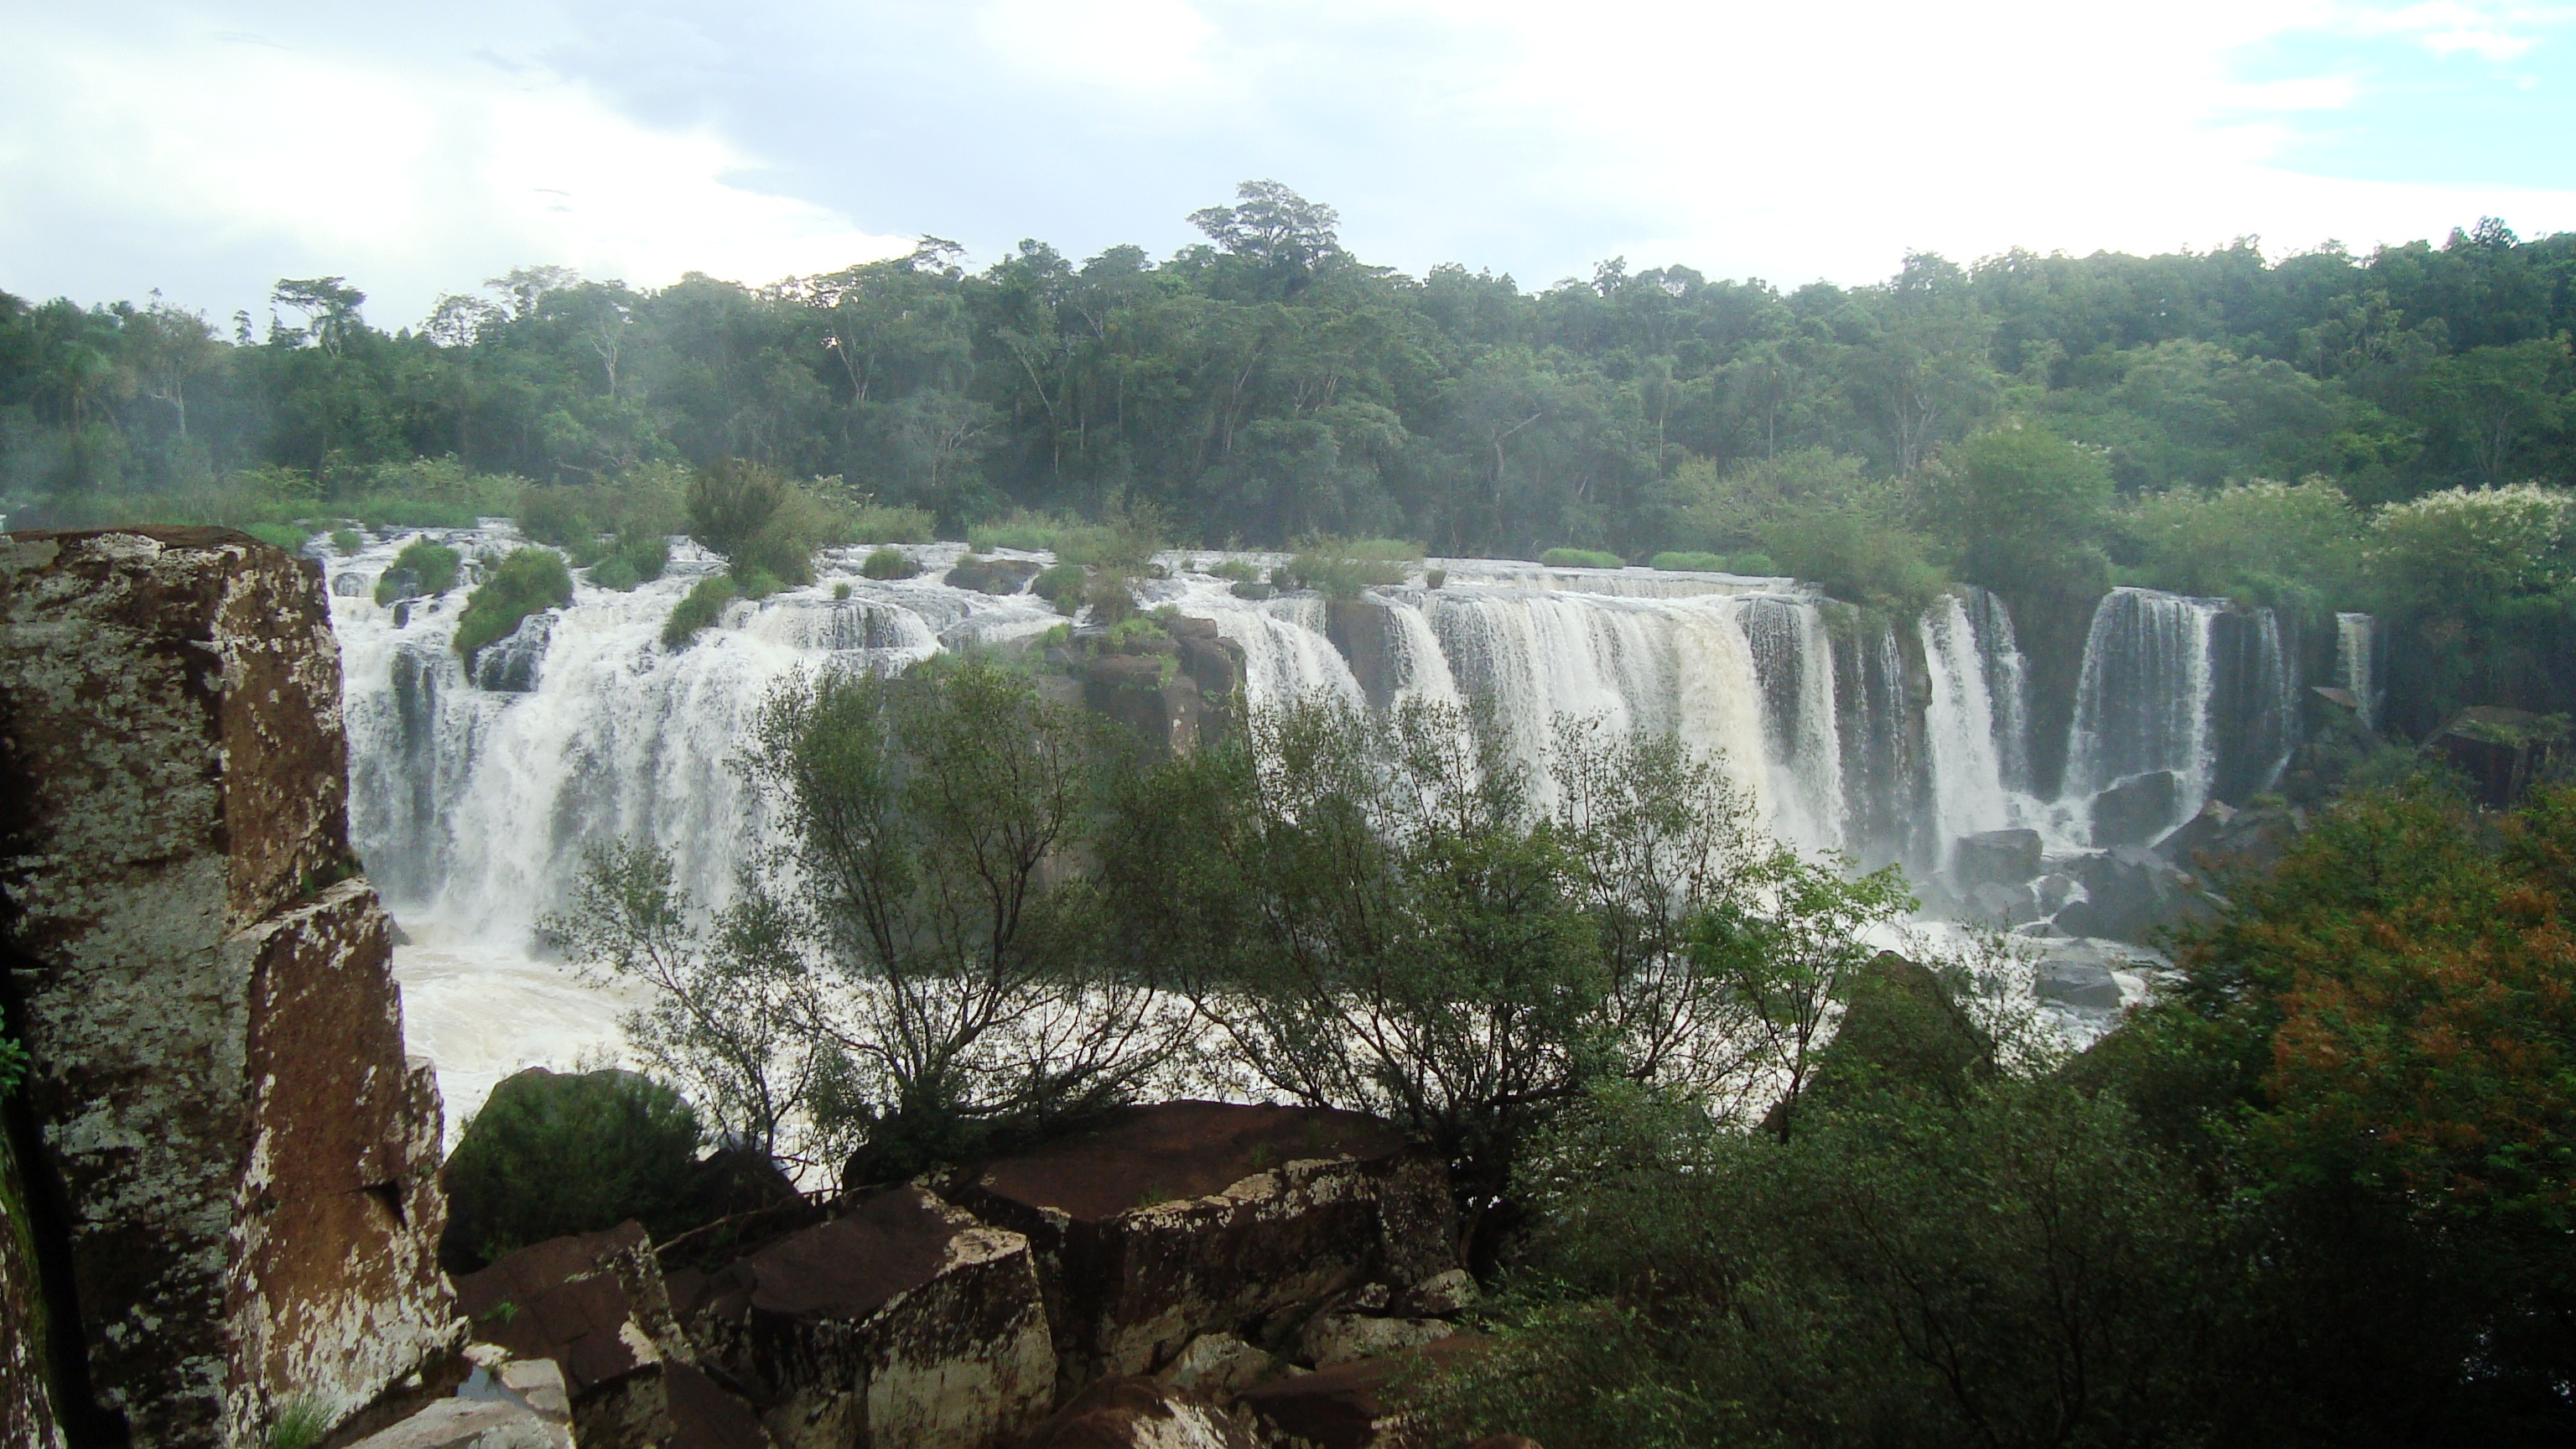 Quilombo Santa Catarina fonte: upload.wikimedia.org